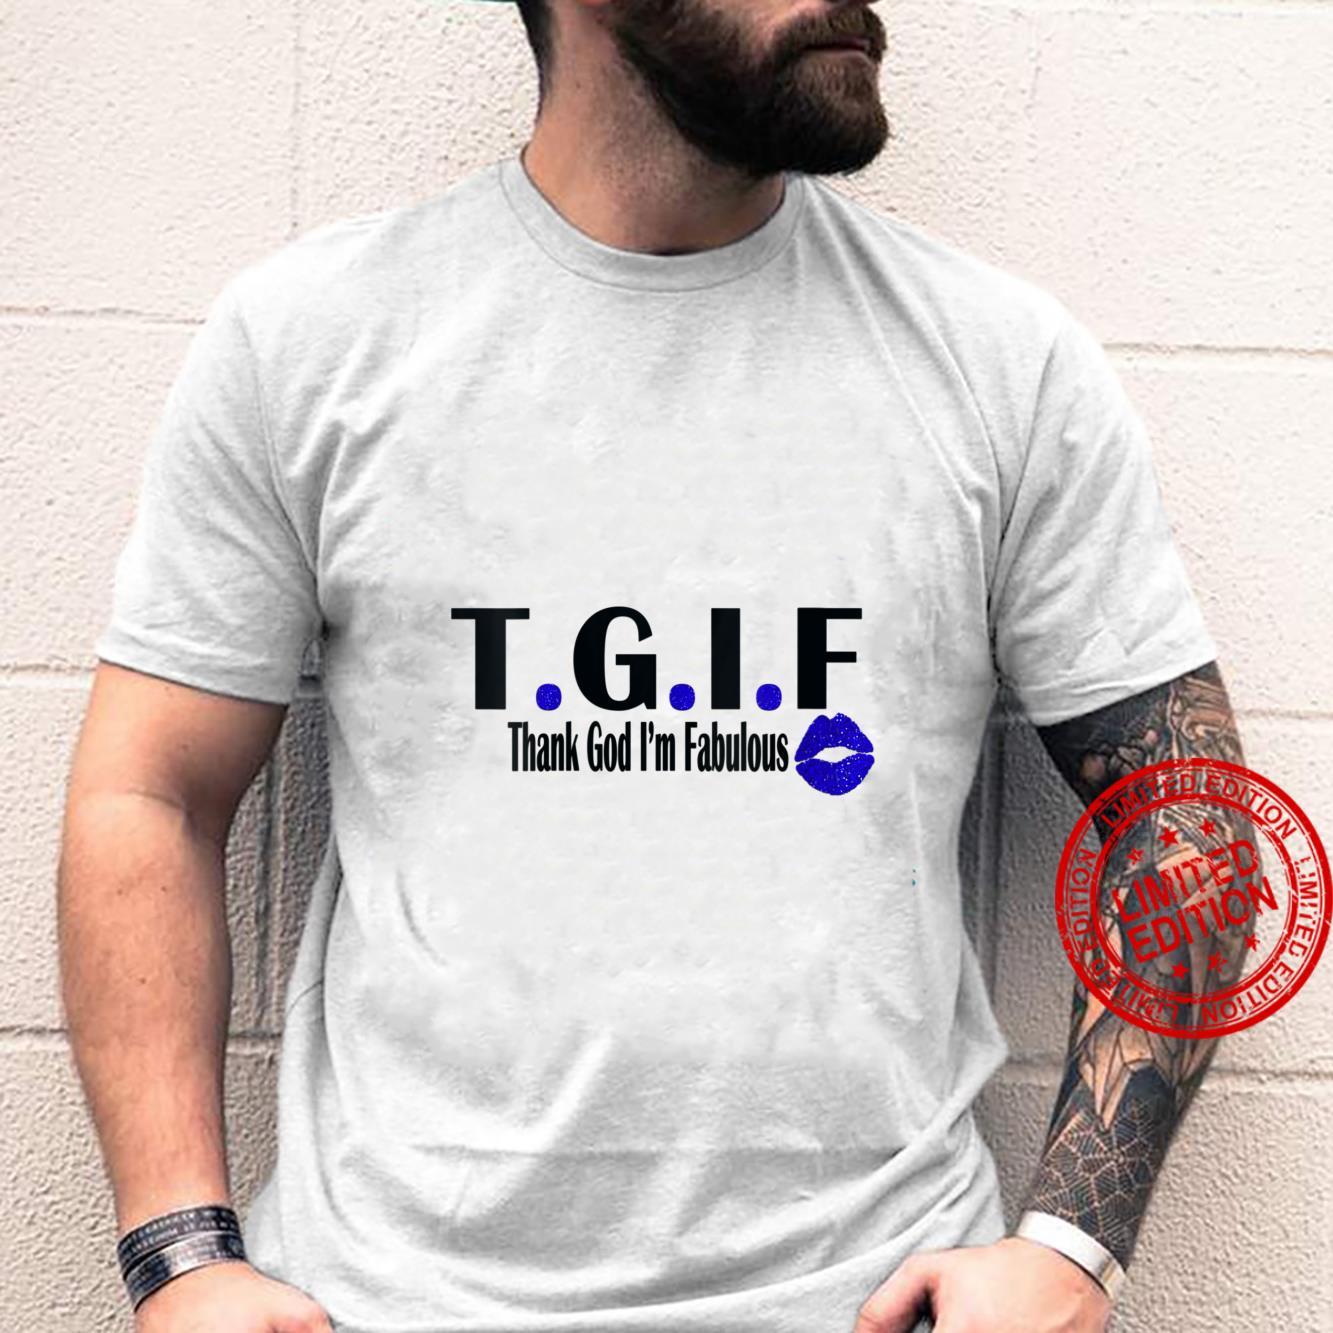 Womens TGIF Thank God I'm Fabulous Cute T.G.I.F Lip Print Shirt